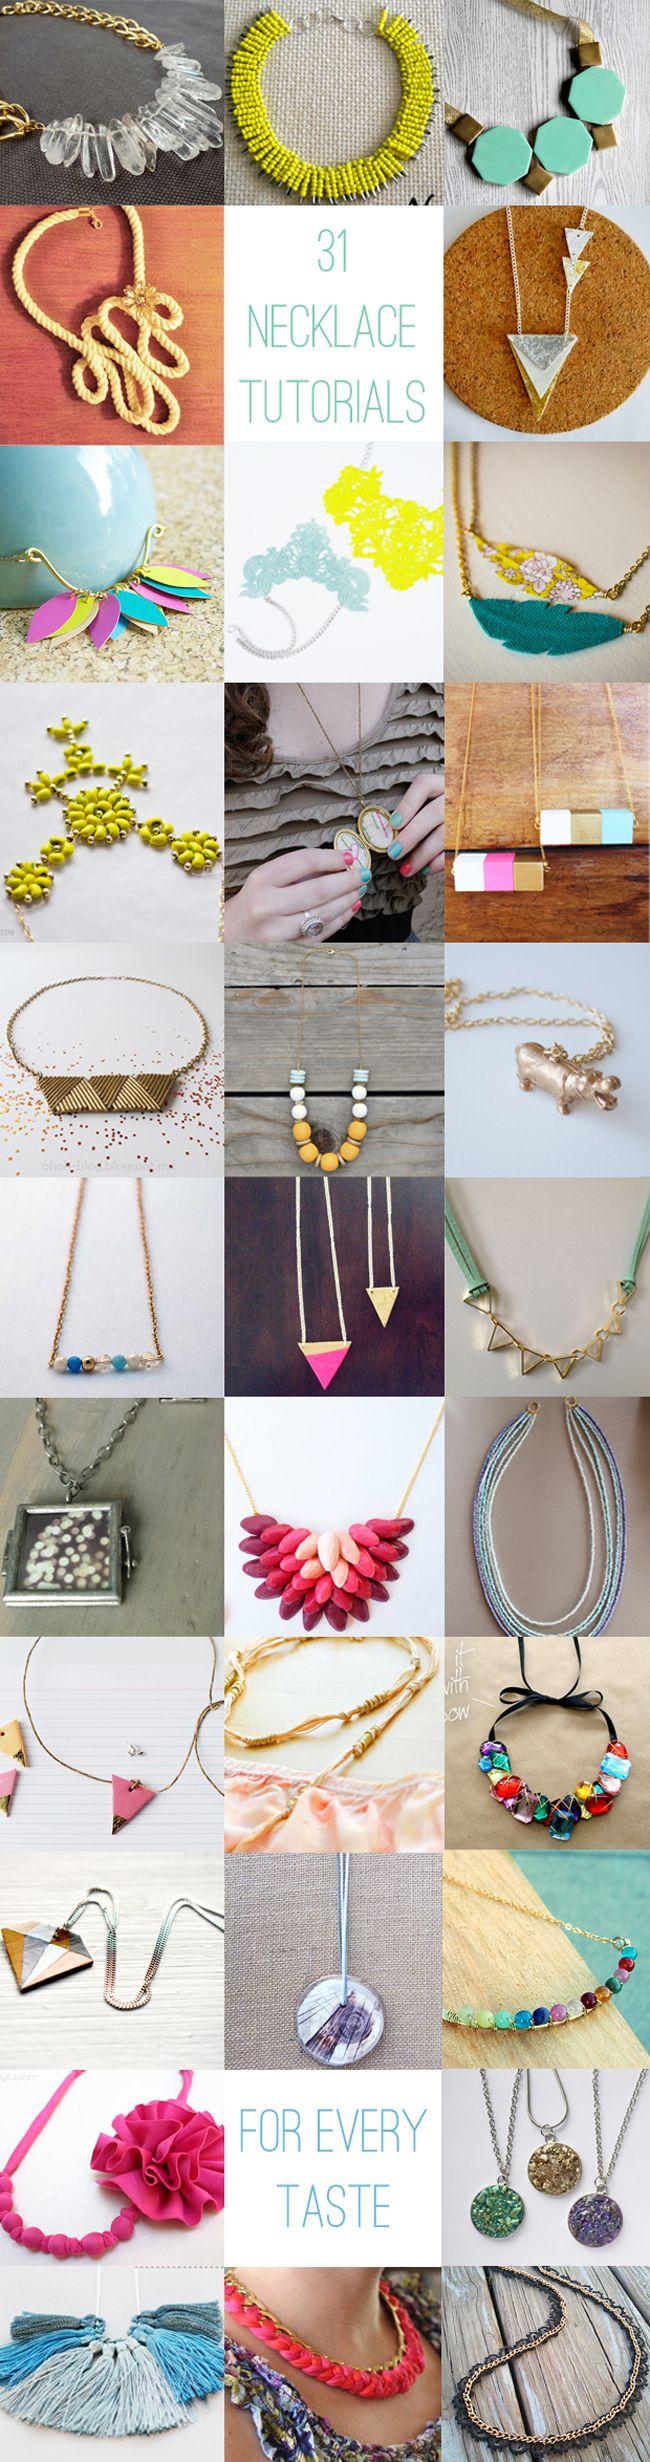 Links to 31 necklace tutorials